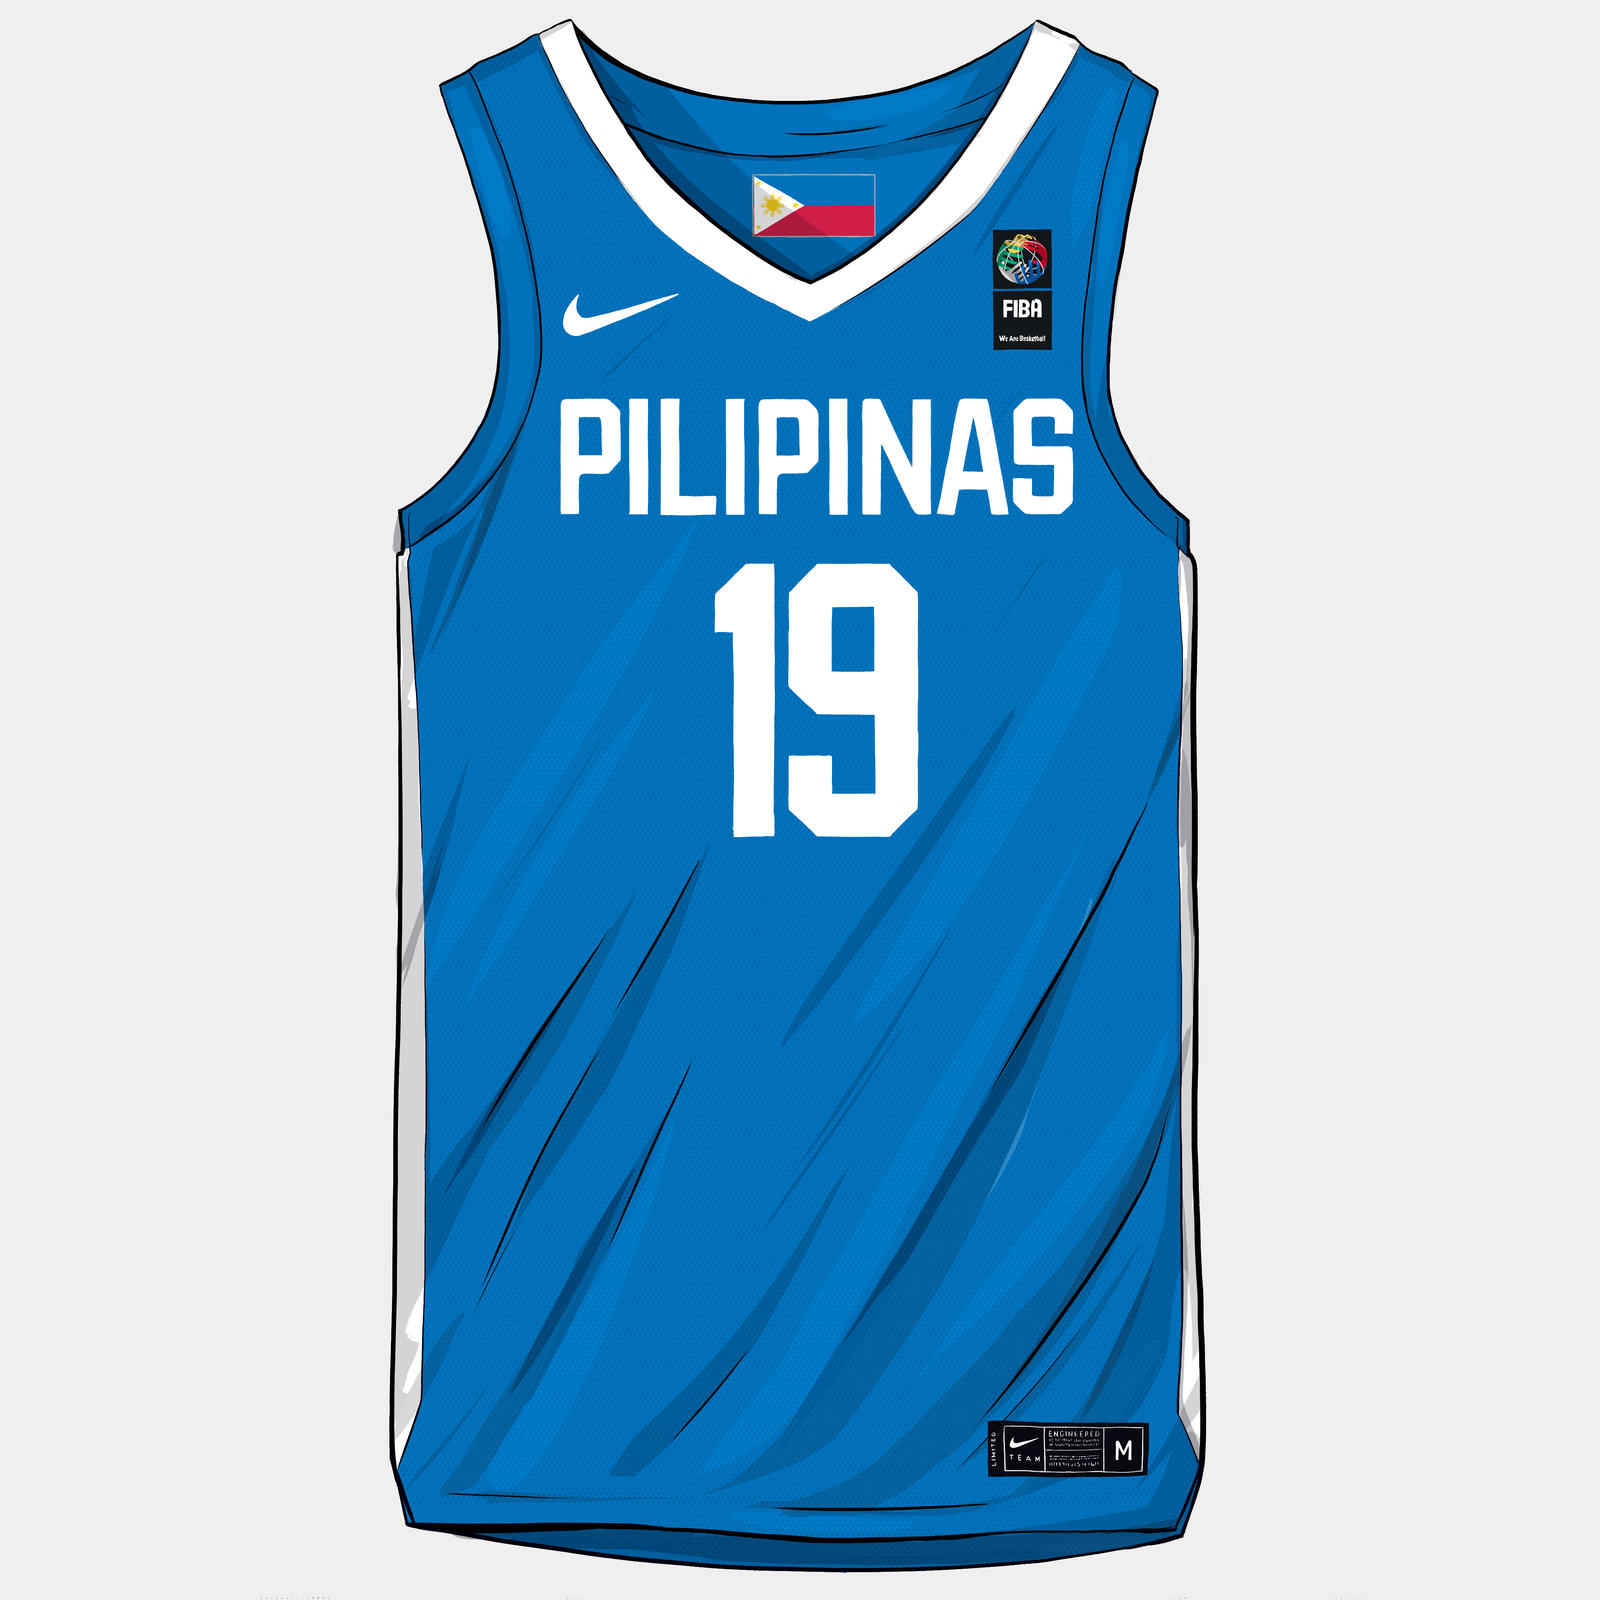 nike-news-philippines-national-team-kit-2019-illustration-1x1_1_89538.jpg